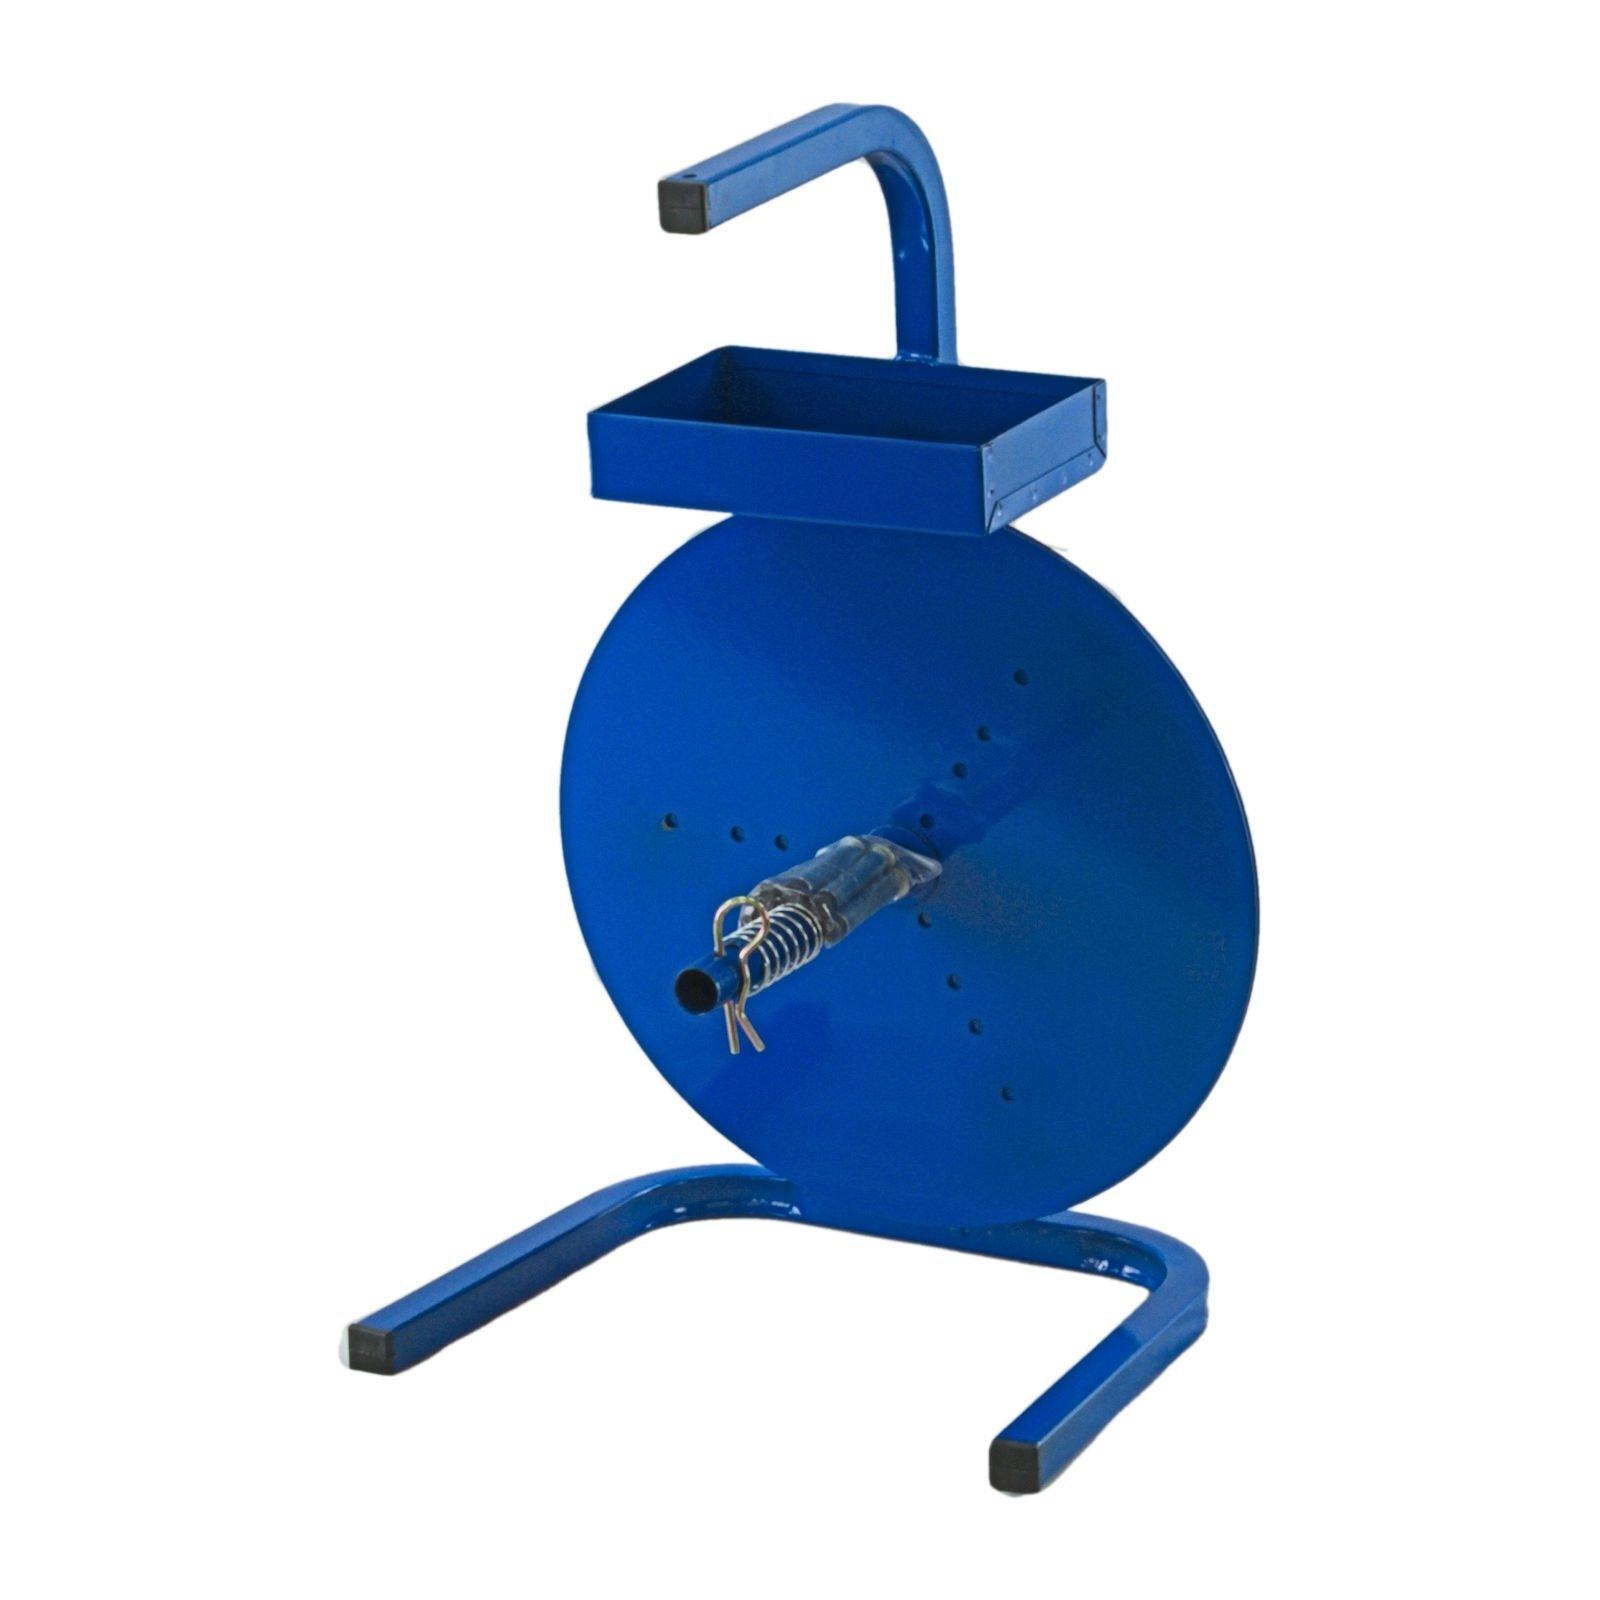 Abrollger/ät 850 m Umreifungsband Umreifungsset 16 mm 200 Verschlussklemmen Bandspanner